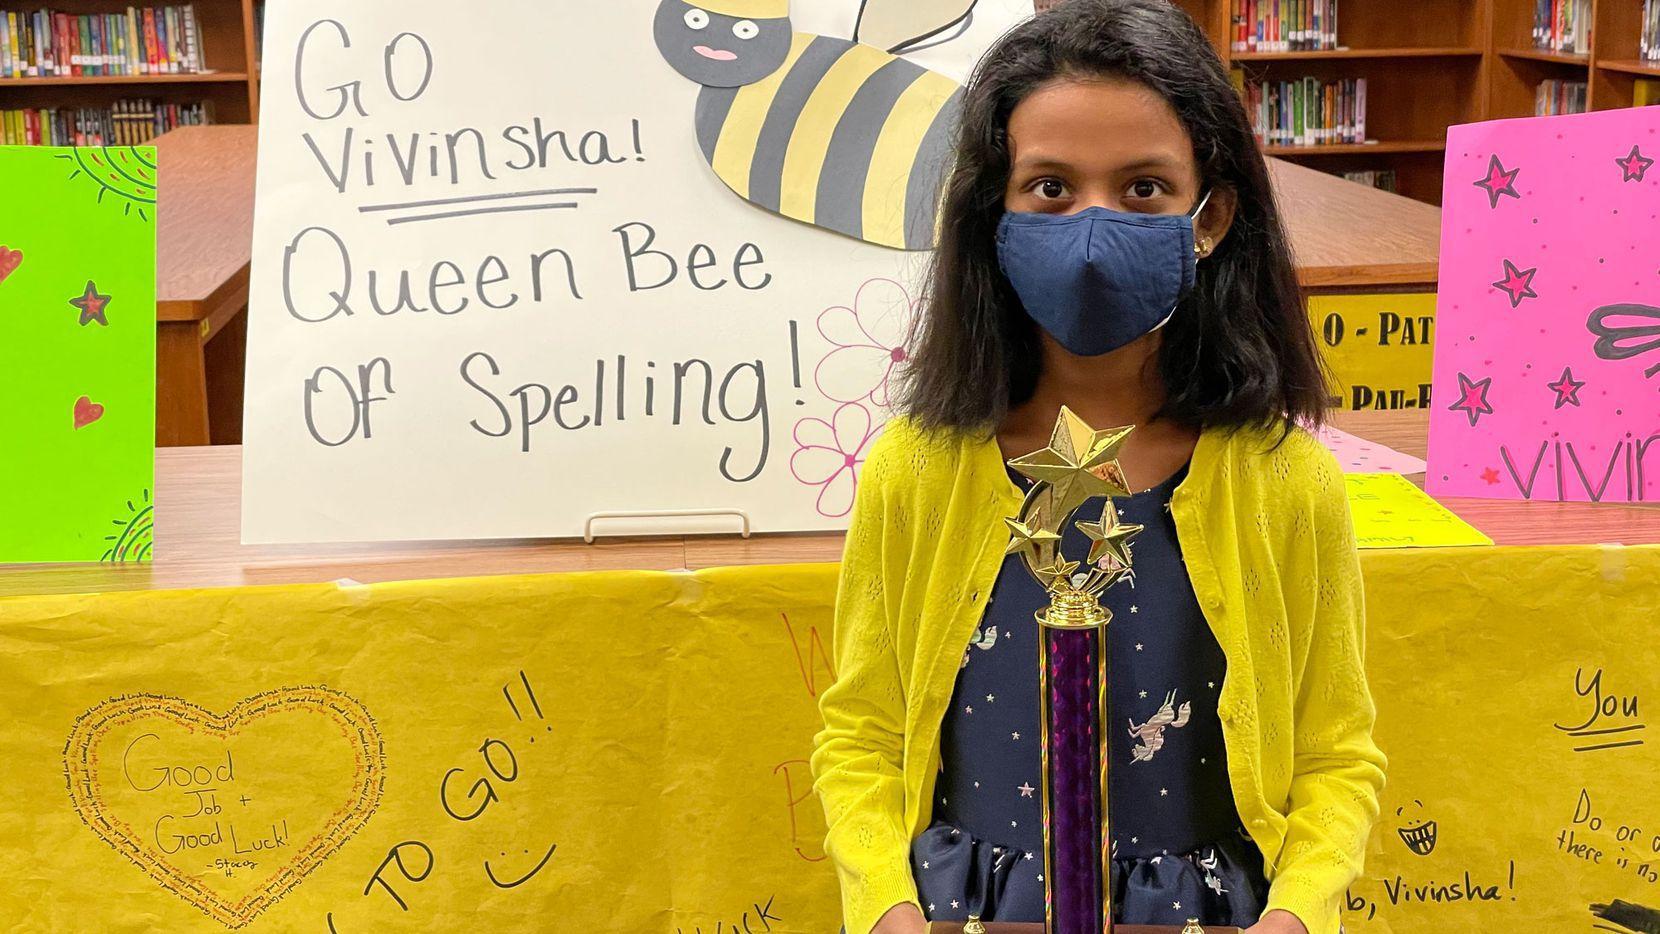 Vivinsha Veduru, 10, is one of two North Texas finalists headed to the Scripps National Bee in Florida next week.